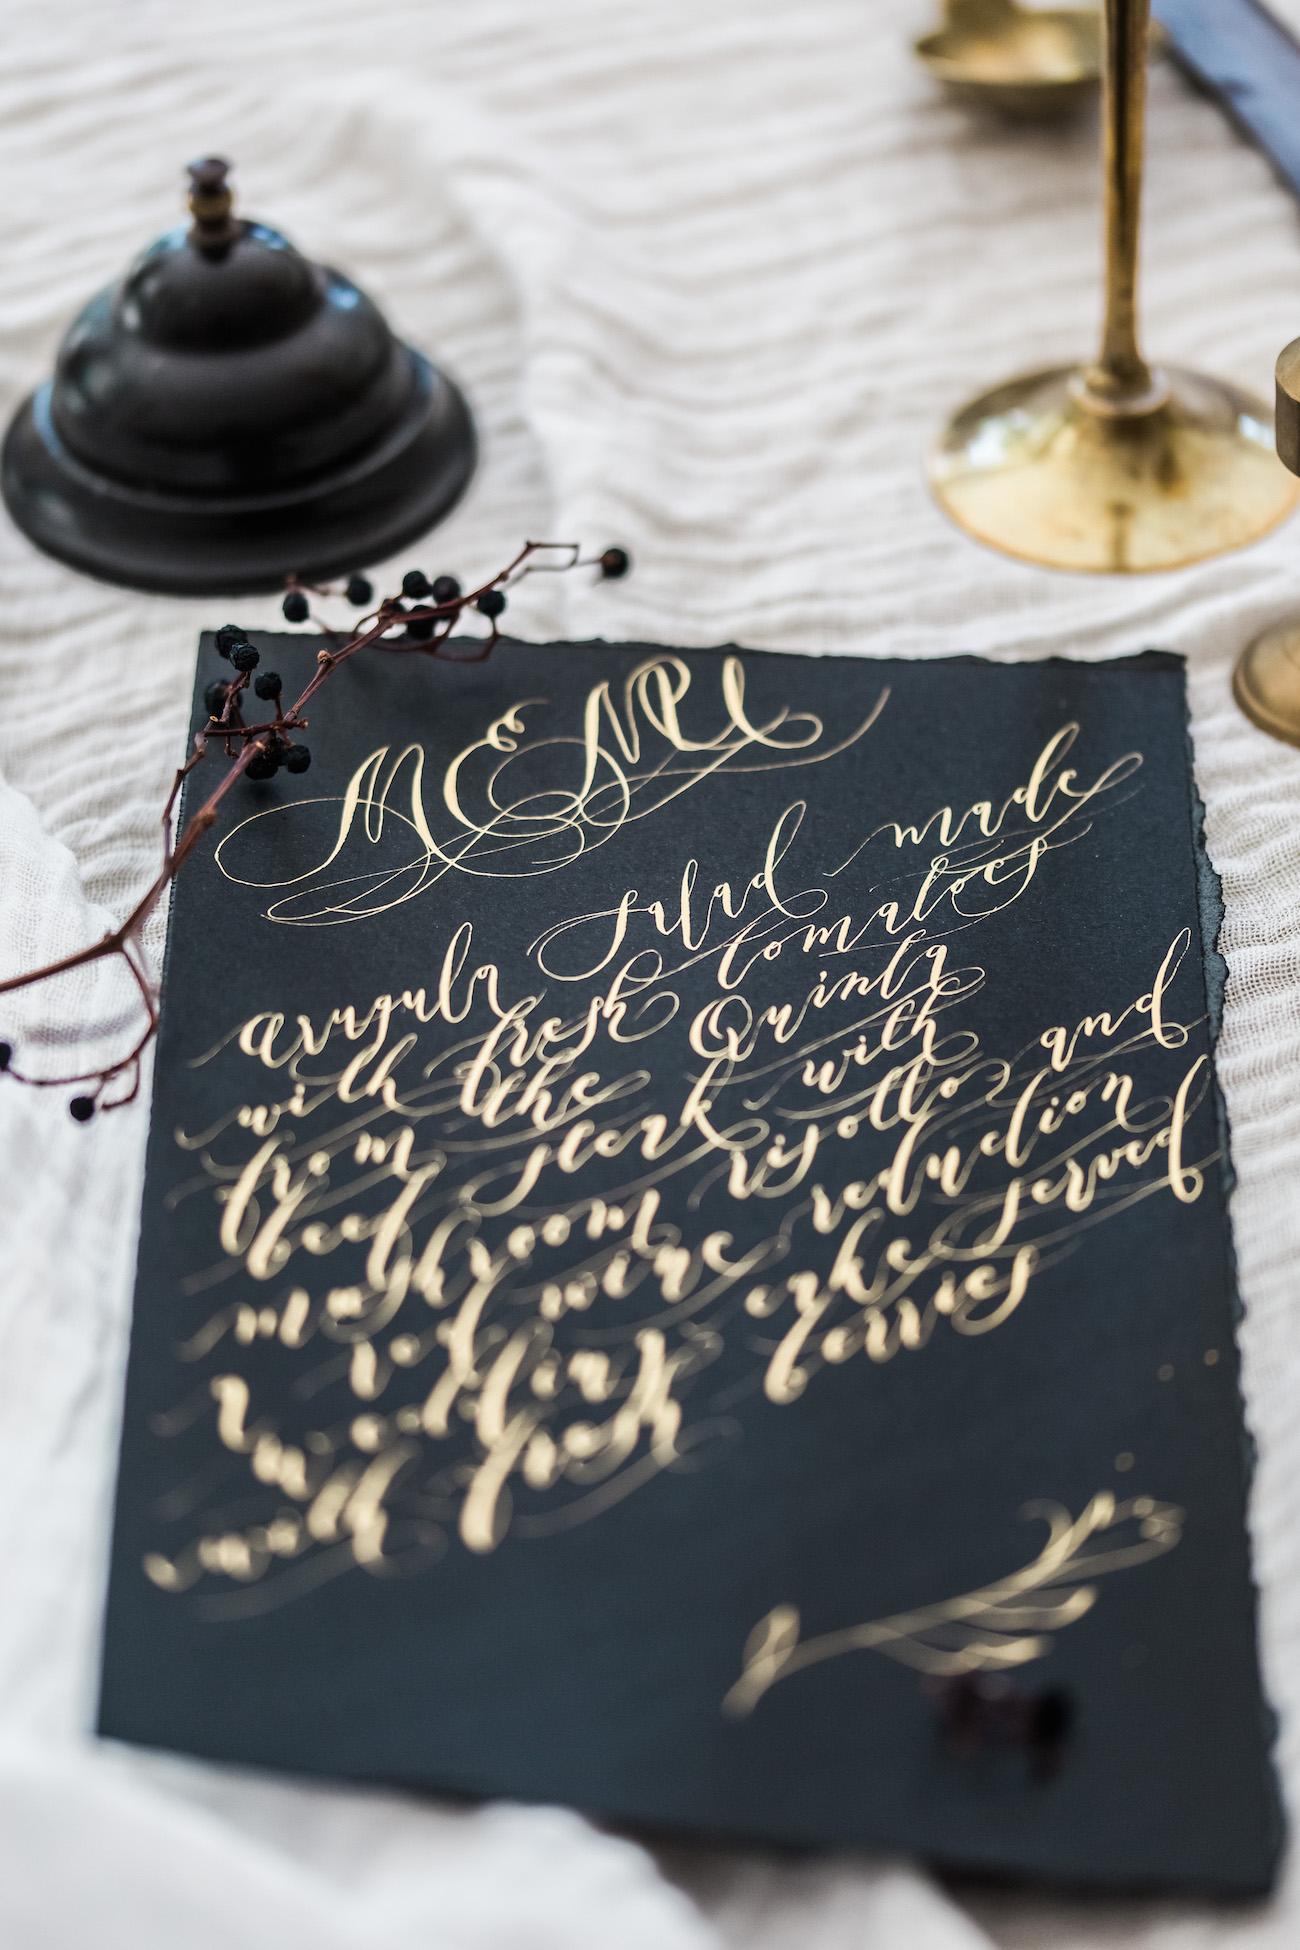 Black Tie Wedding Invitations Black Wedding Menu With Gold